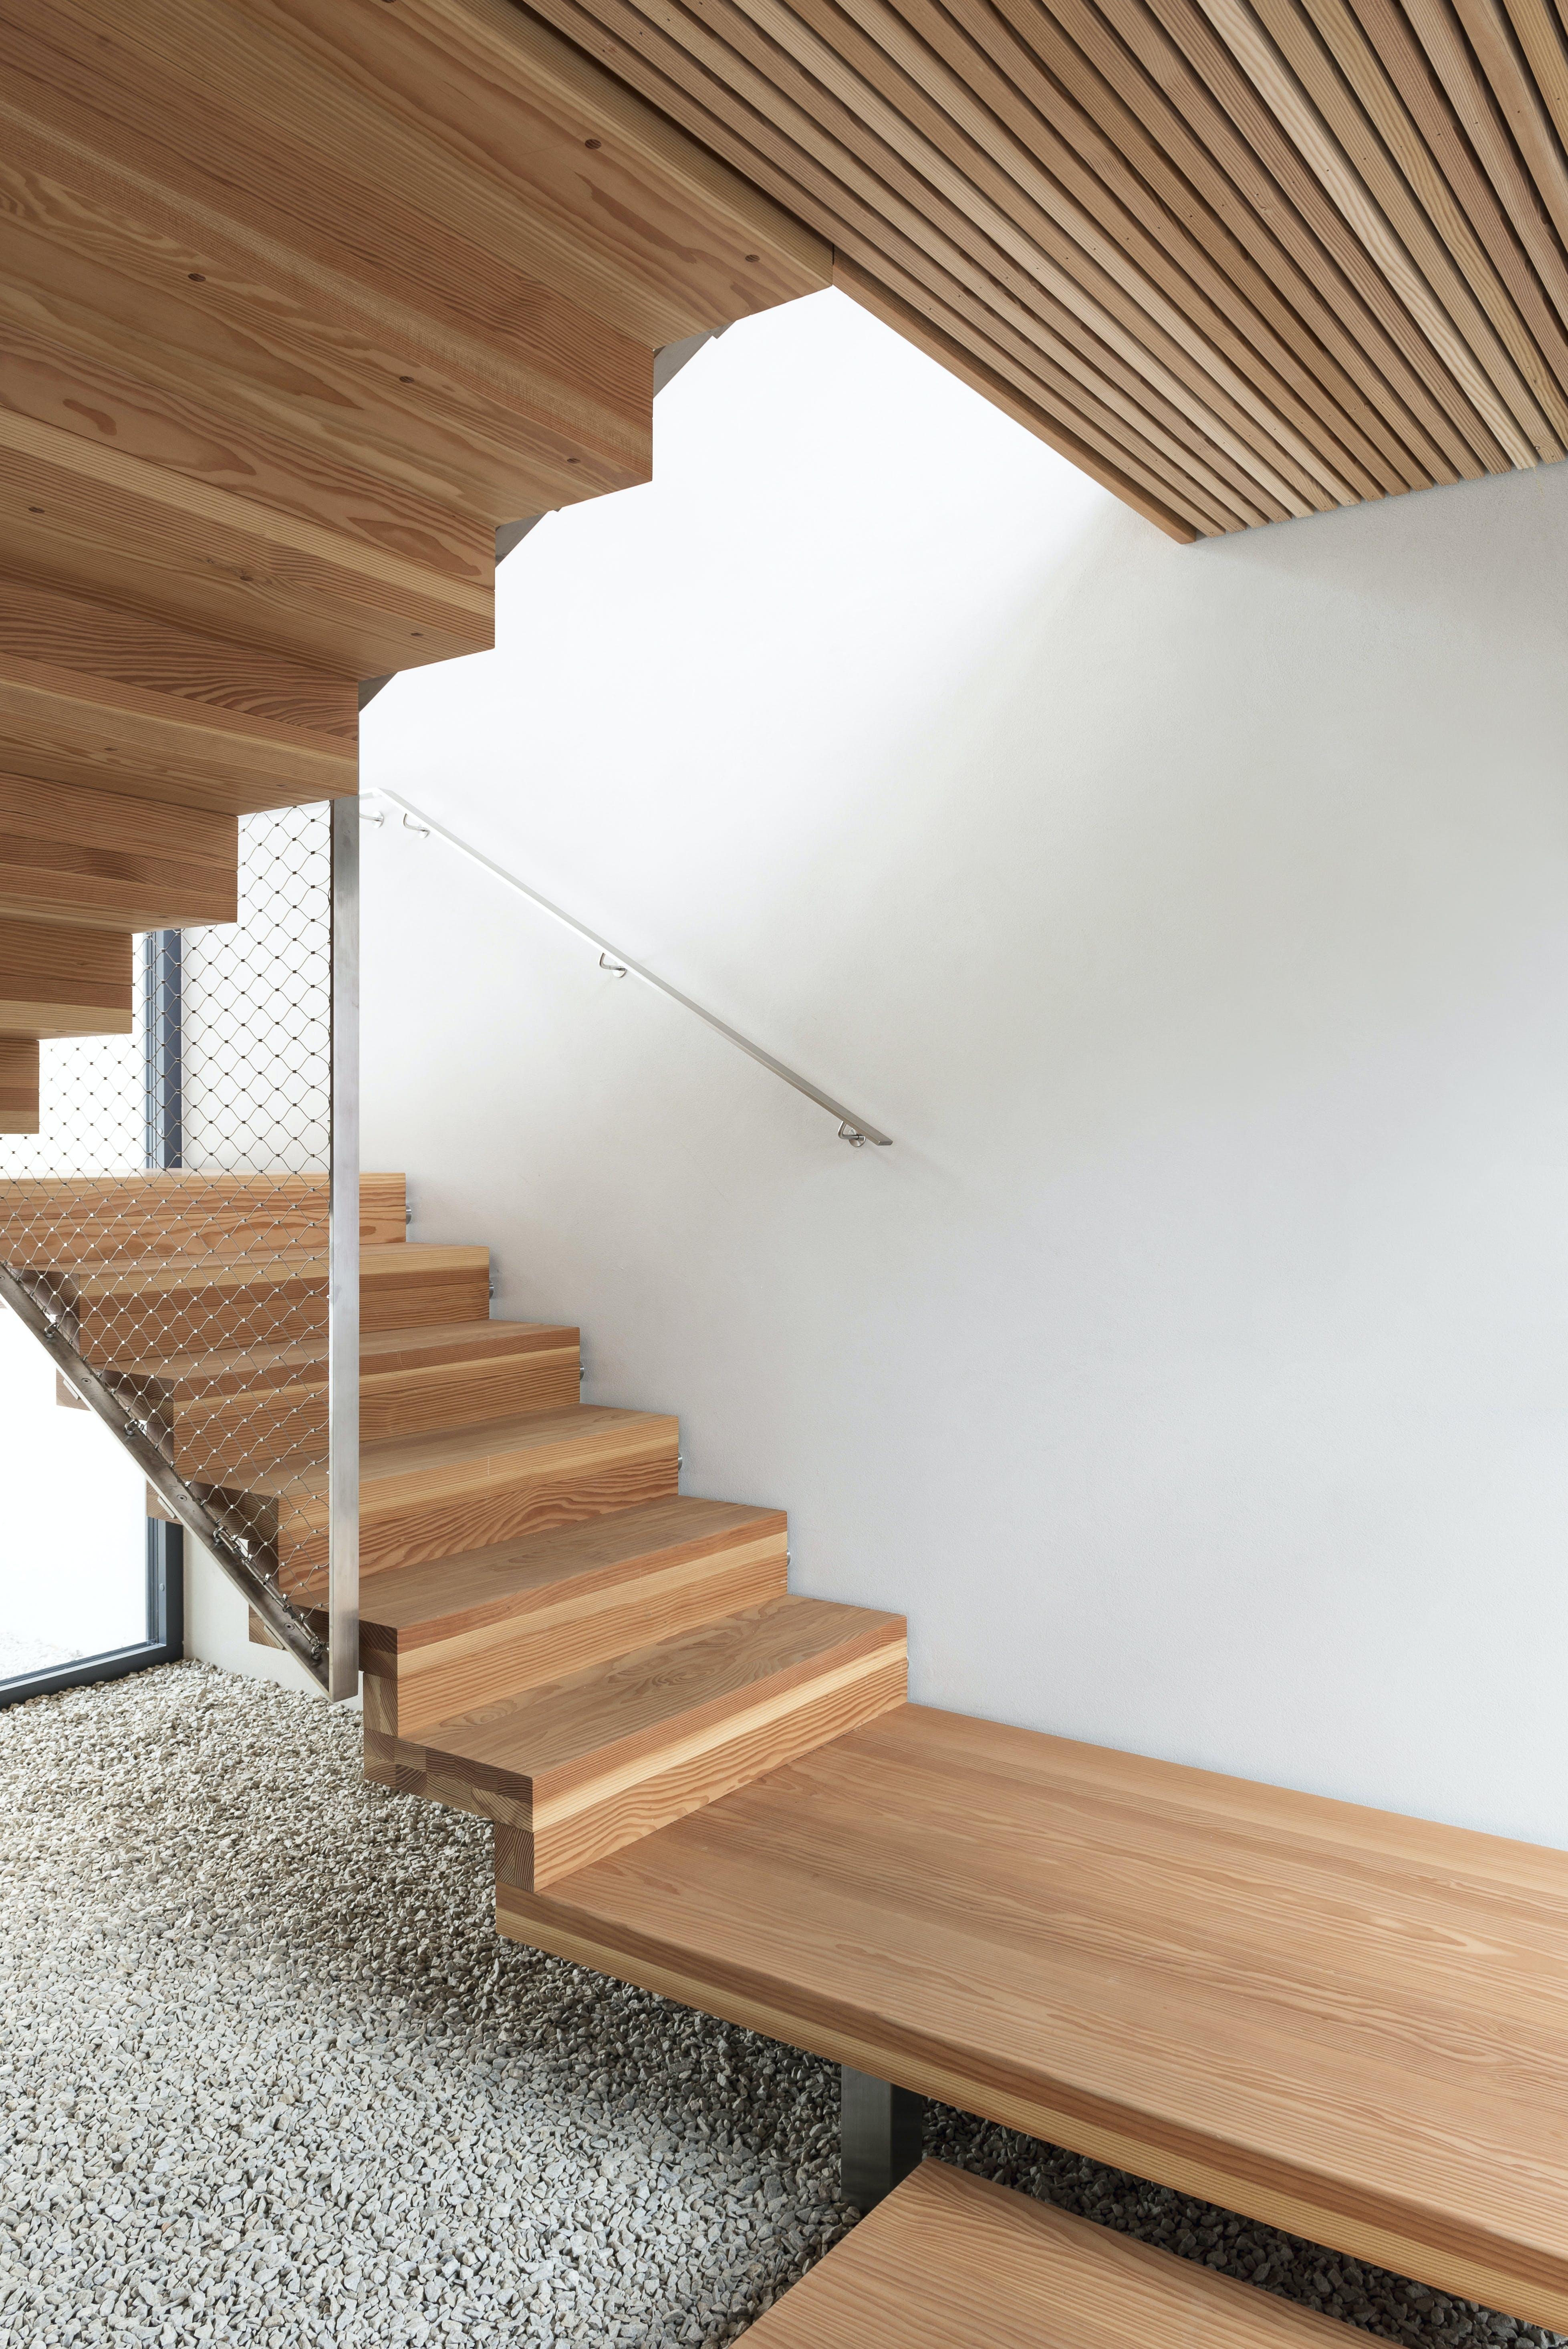 trappe grus træ